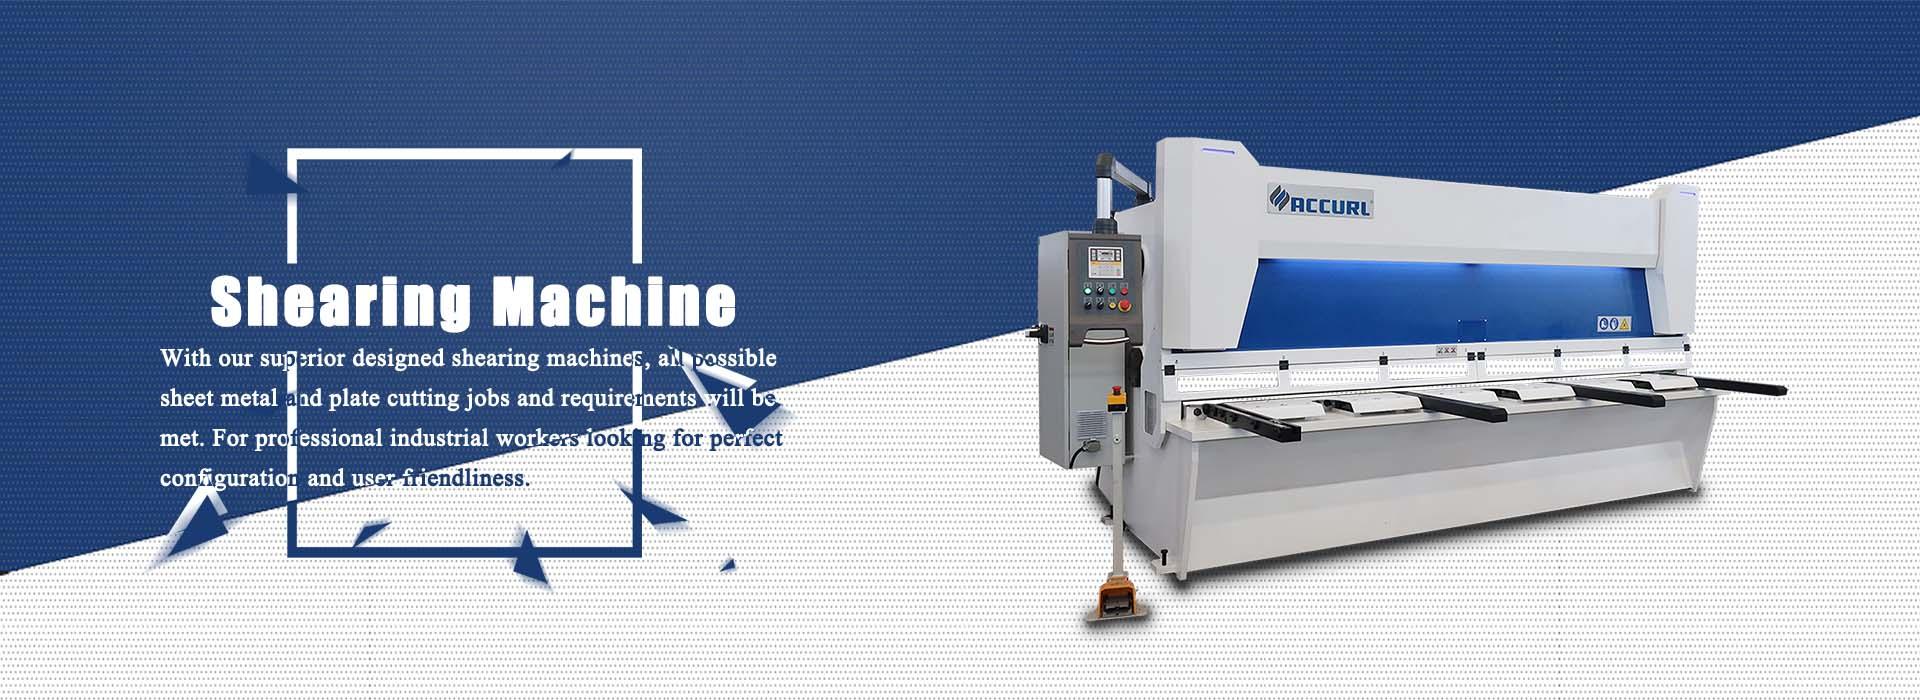 Banner de máquina de corte